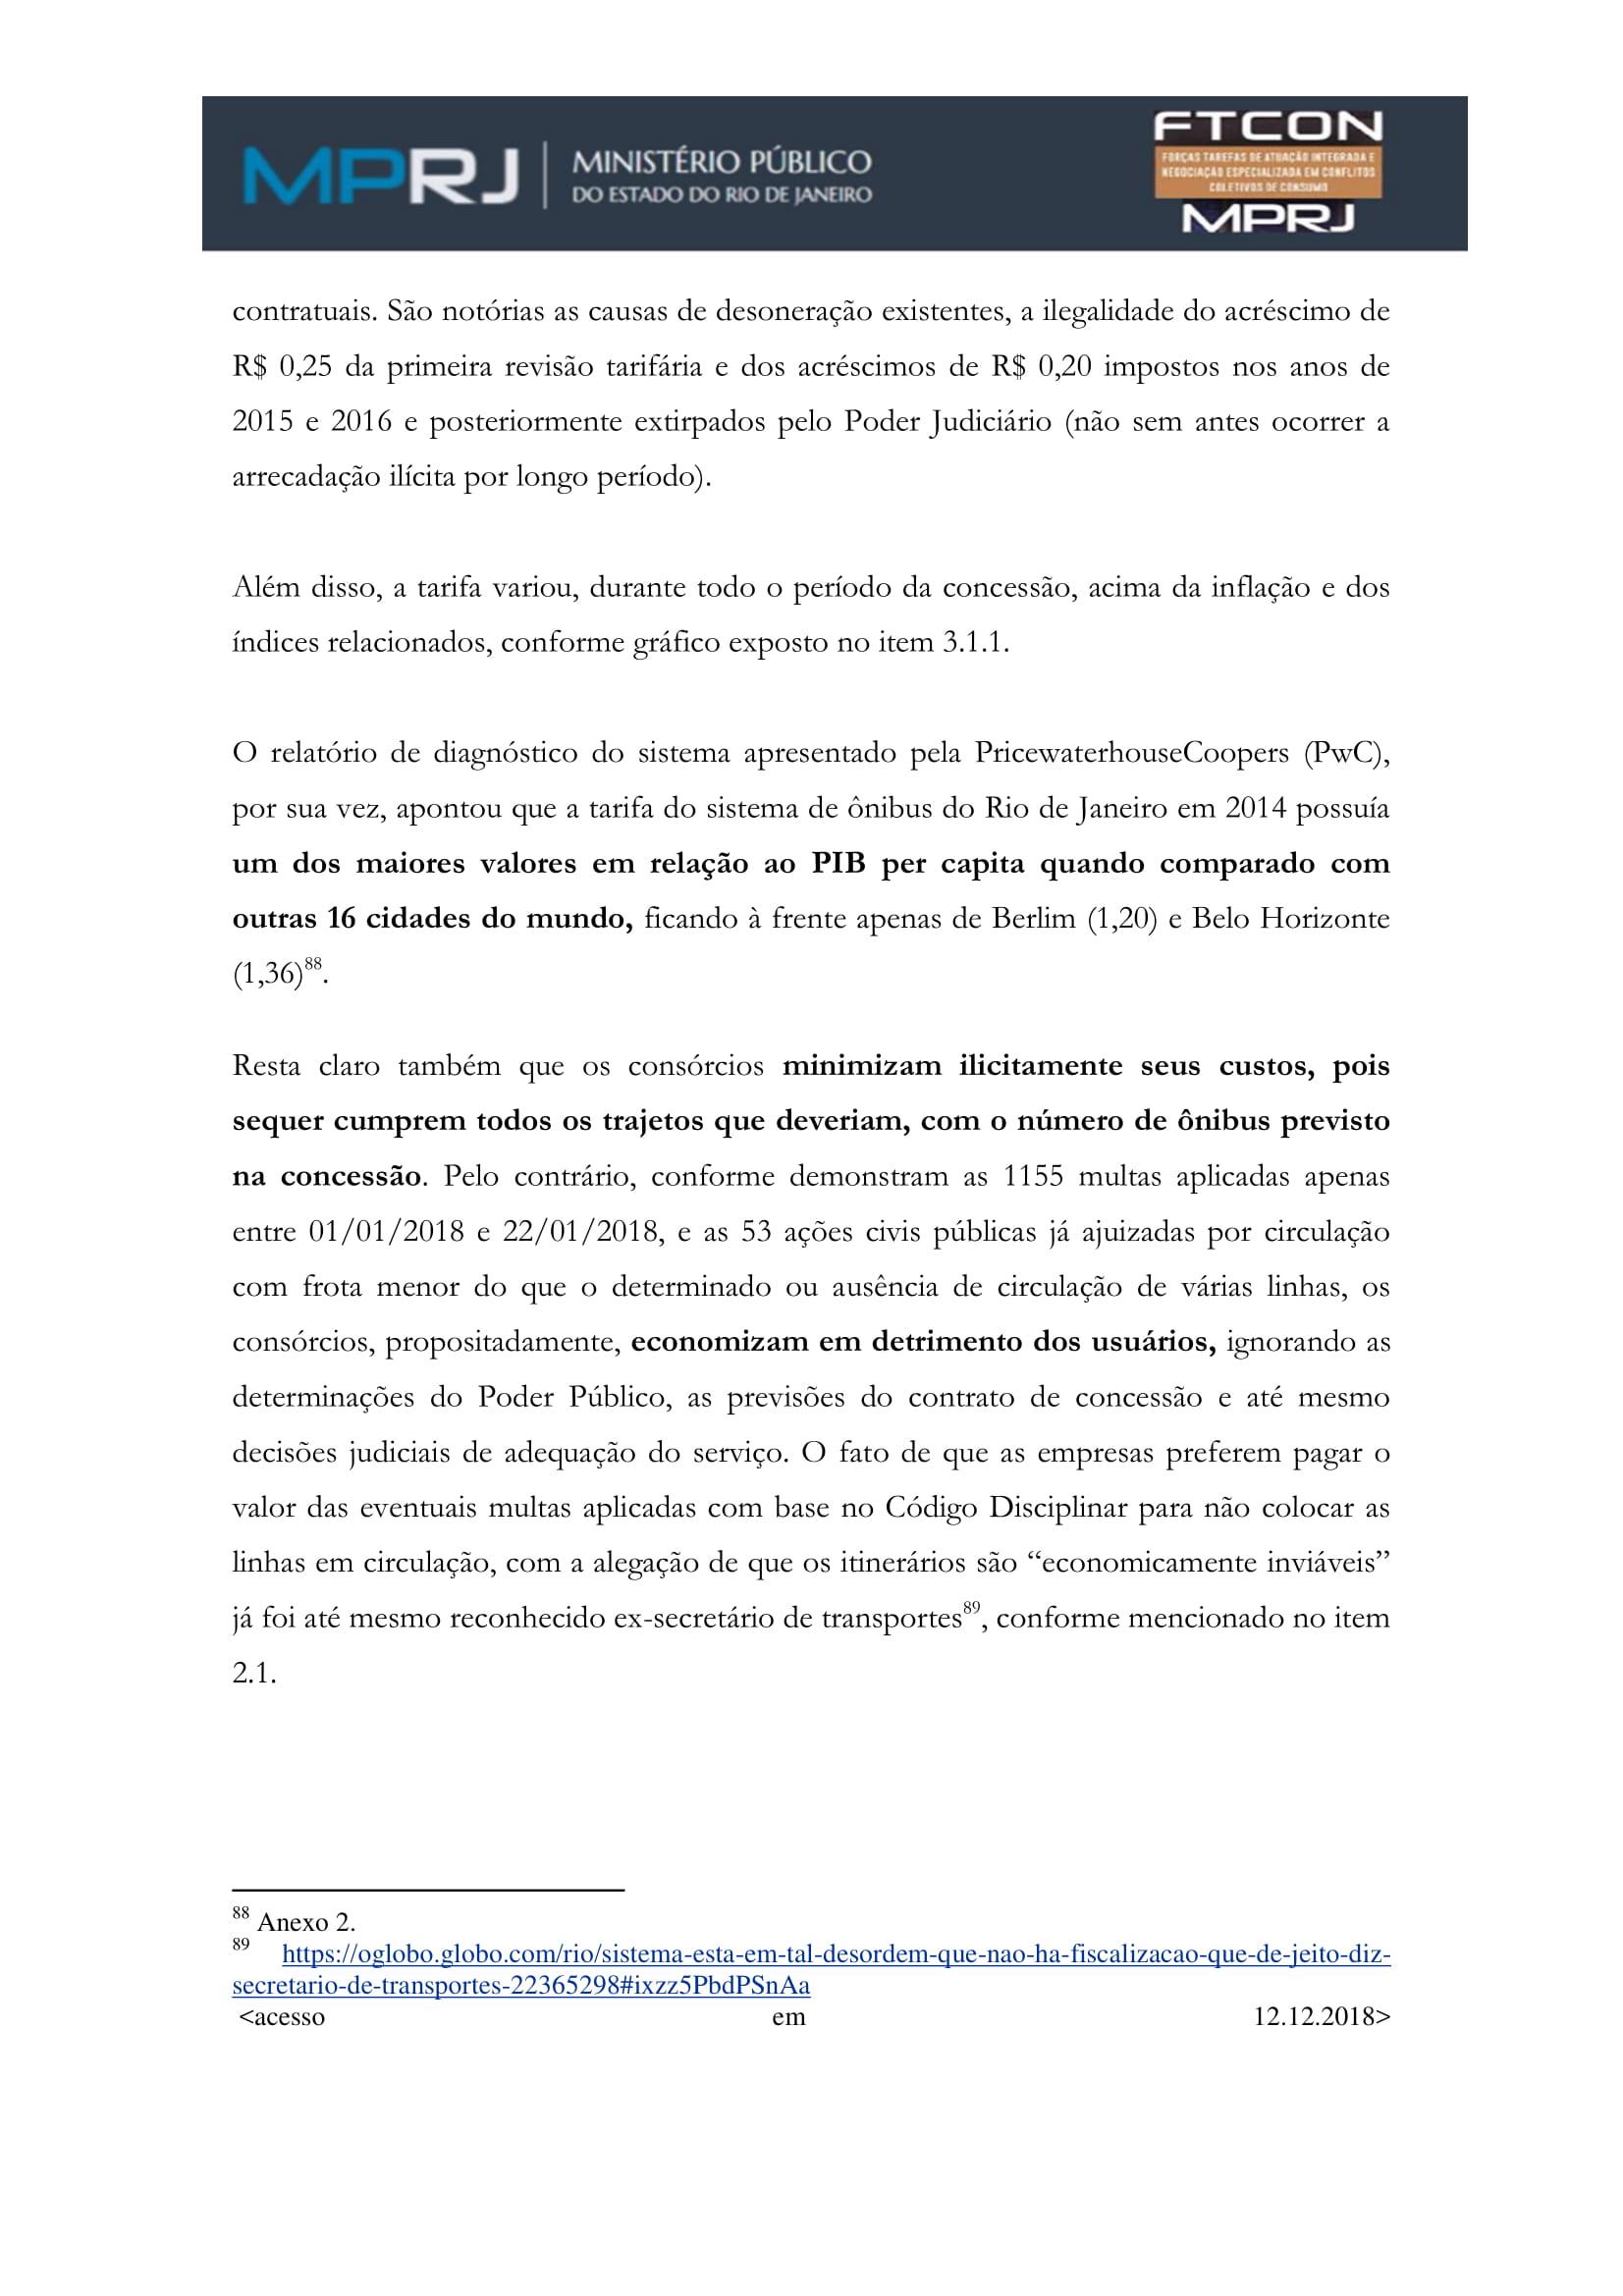 acp_caducidade_onibus_dr_rt-097